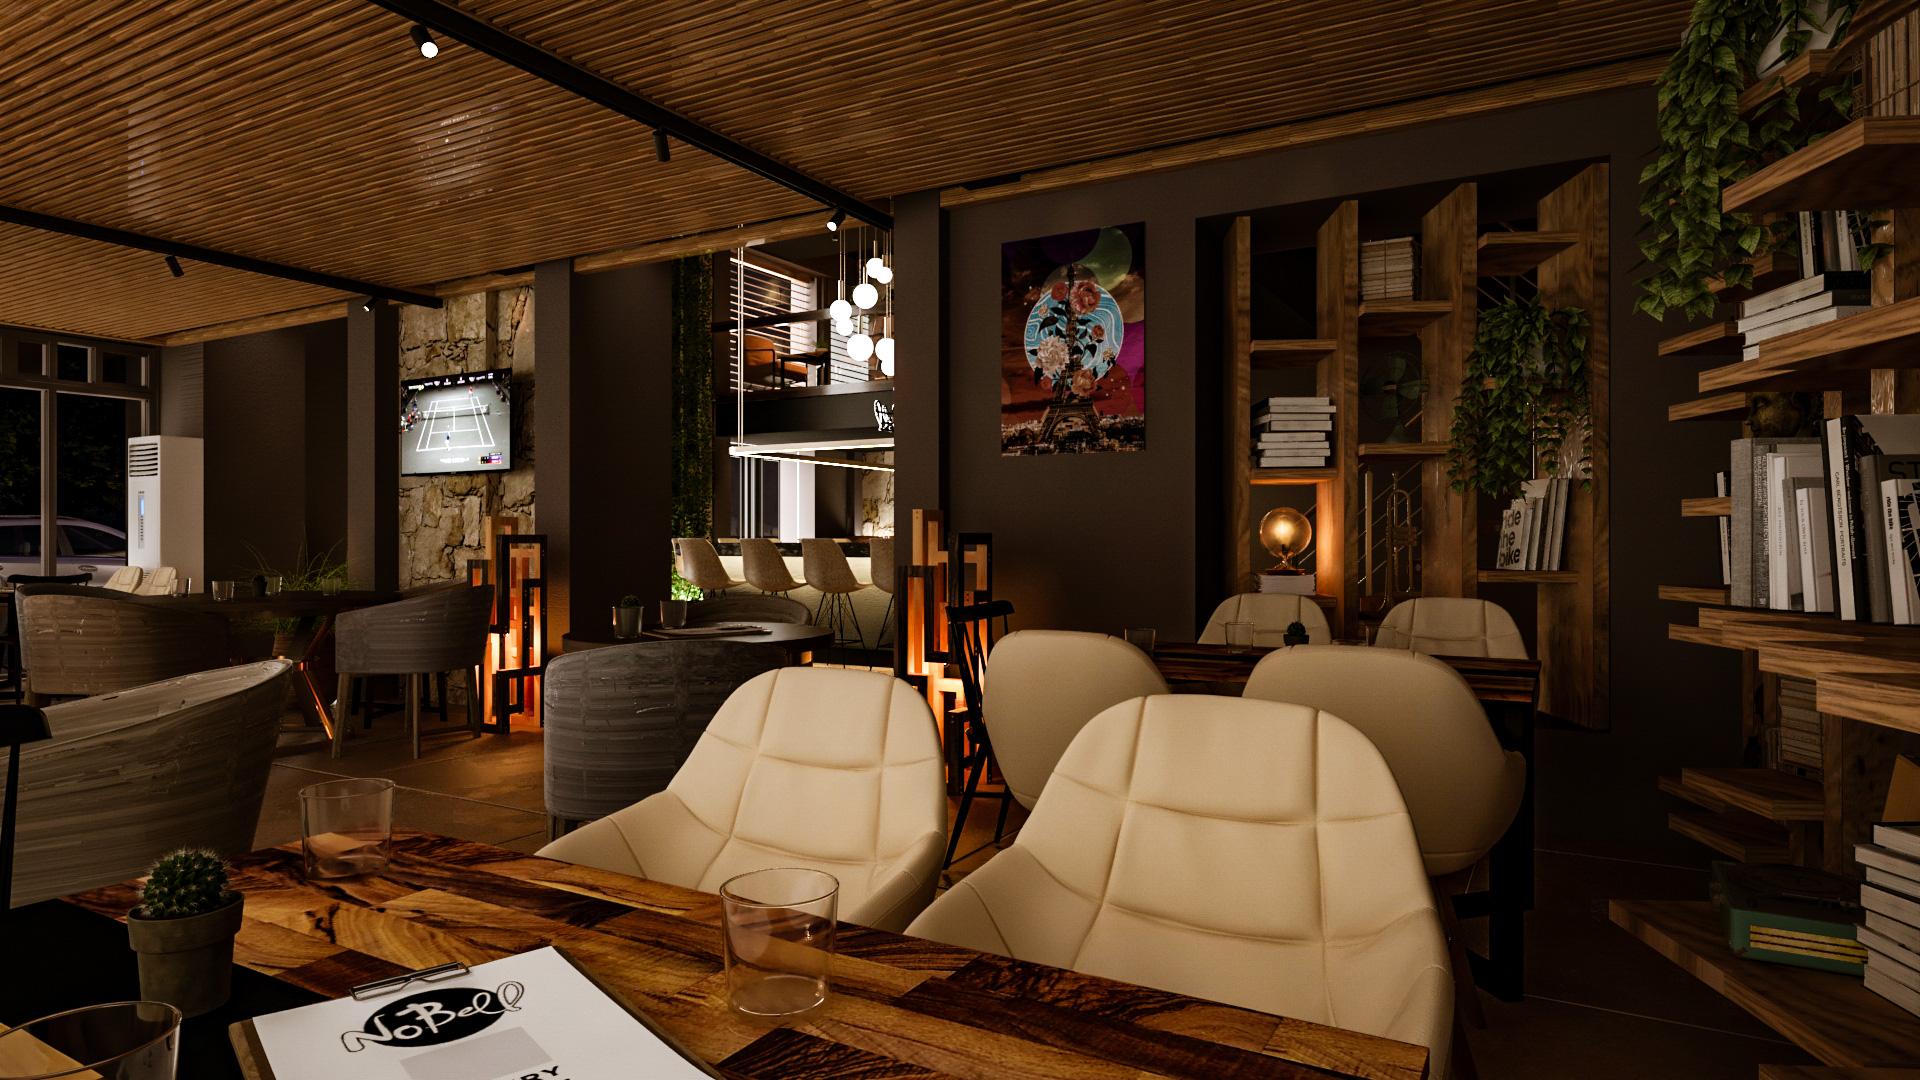 Nobell 2| Interior Design | ZAFIRAKIS DIMITRIS